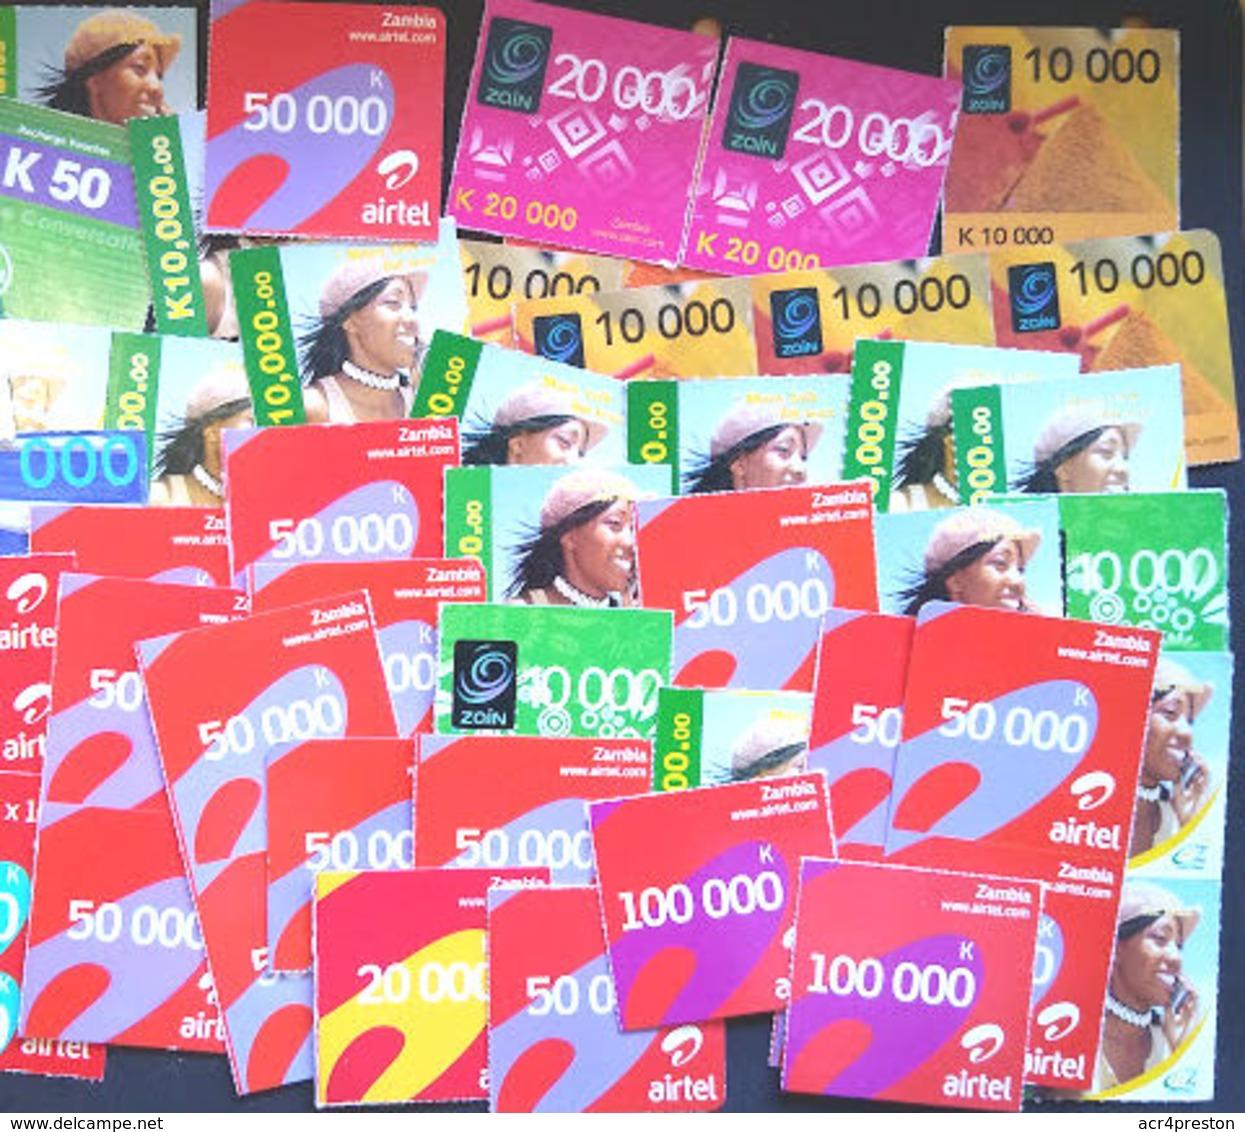 Tc063 ZAMBIA, Small Lot Of Used Phonecards, Zamtel, Zain, Airtel - Zambia